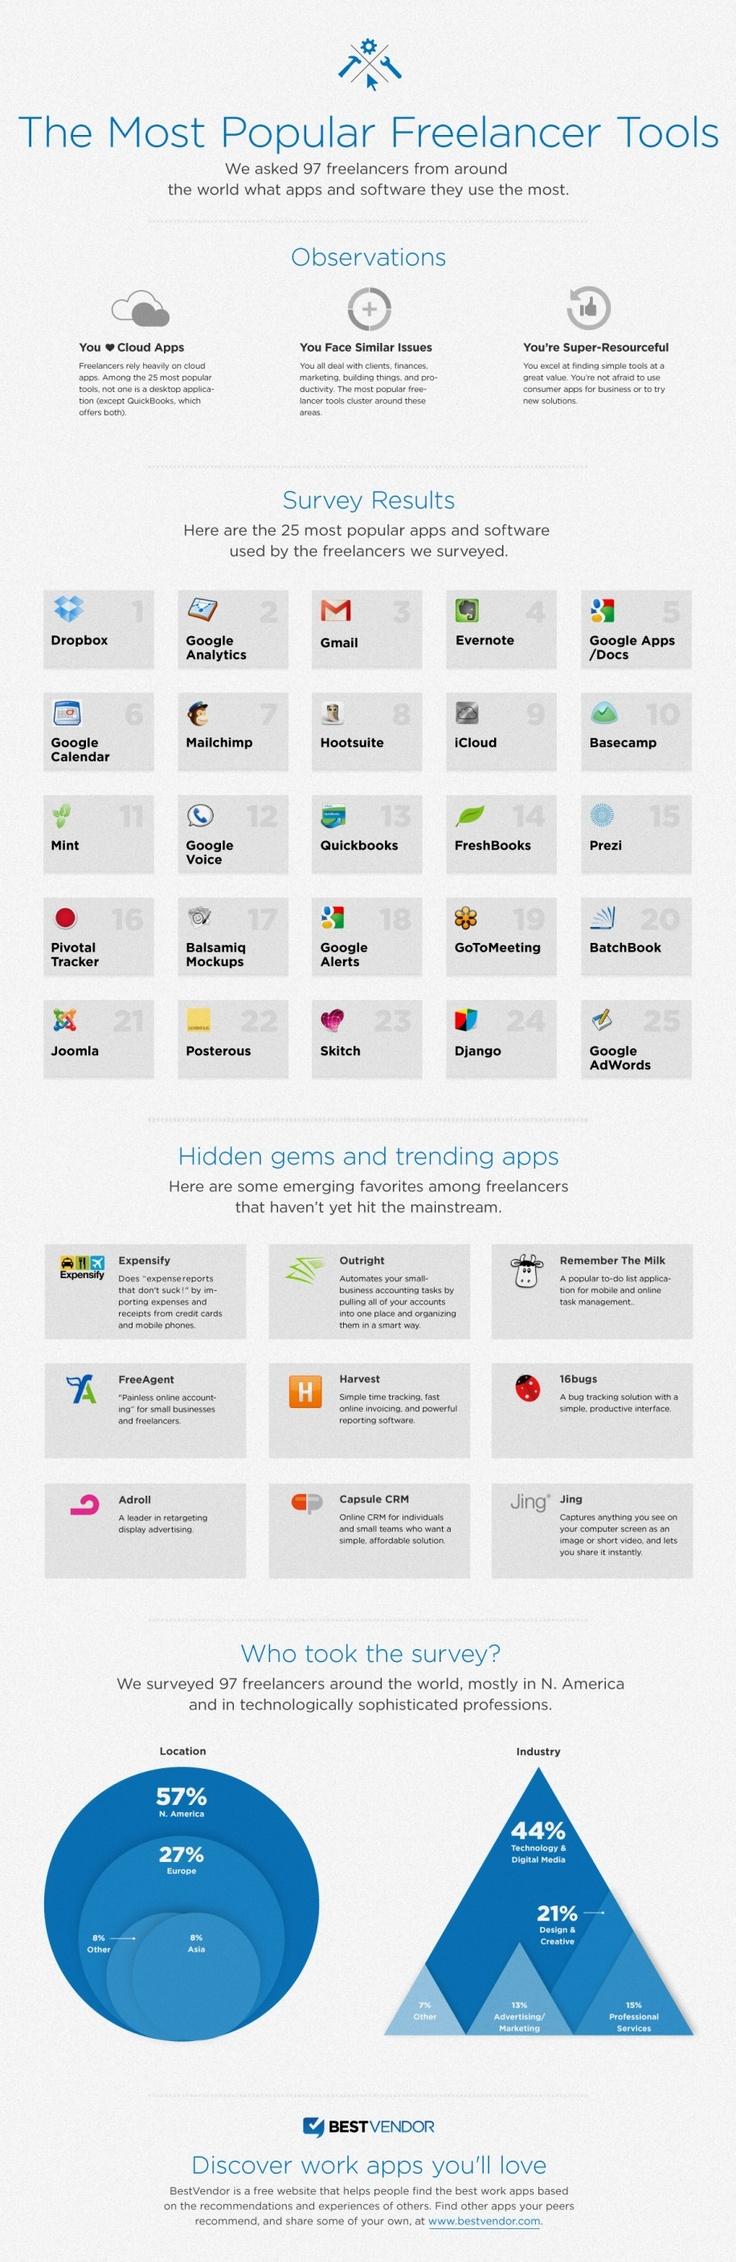 Die 25 beliebtesten Freelancer-Tools [Infografik]   http://t3n.de/news/25-beliebtesten-freelancer-tools-409900/beliebtesten-25-apps/